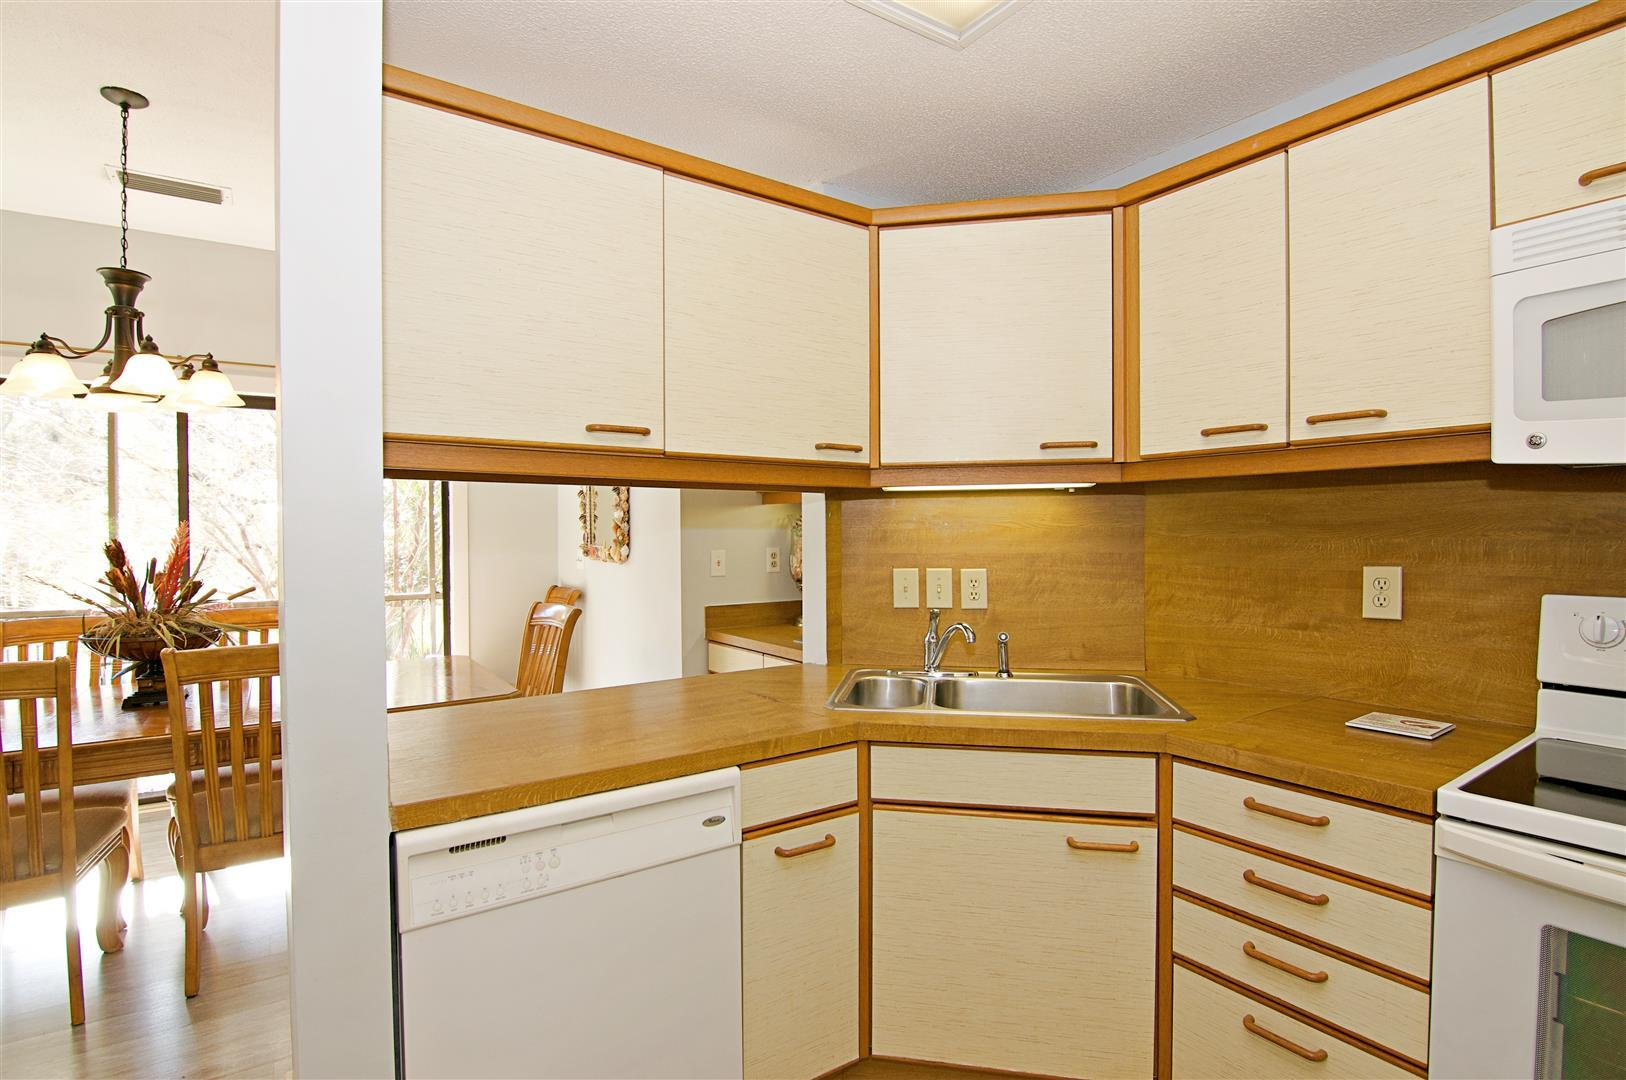 Seabrook Island Homes For Sale - 3020 Ocean Winds, Seabrook Island, SC - 41